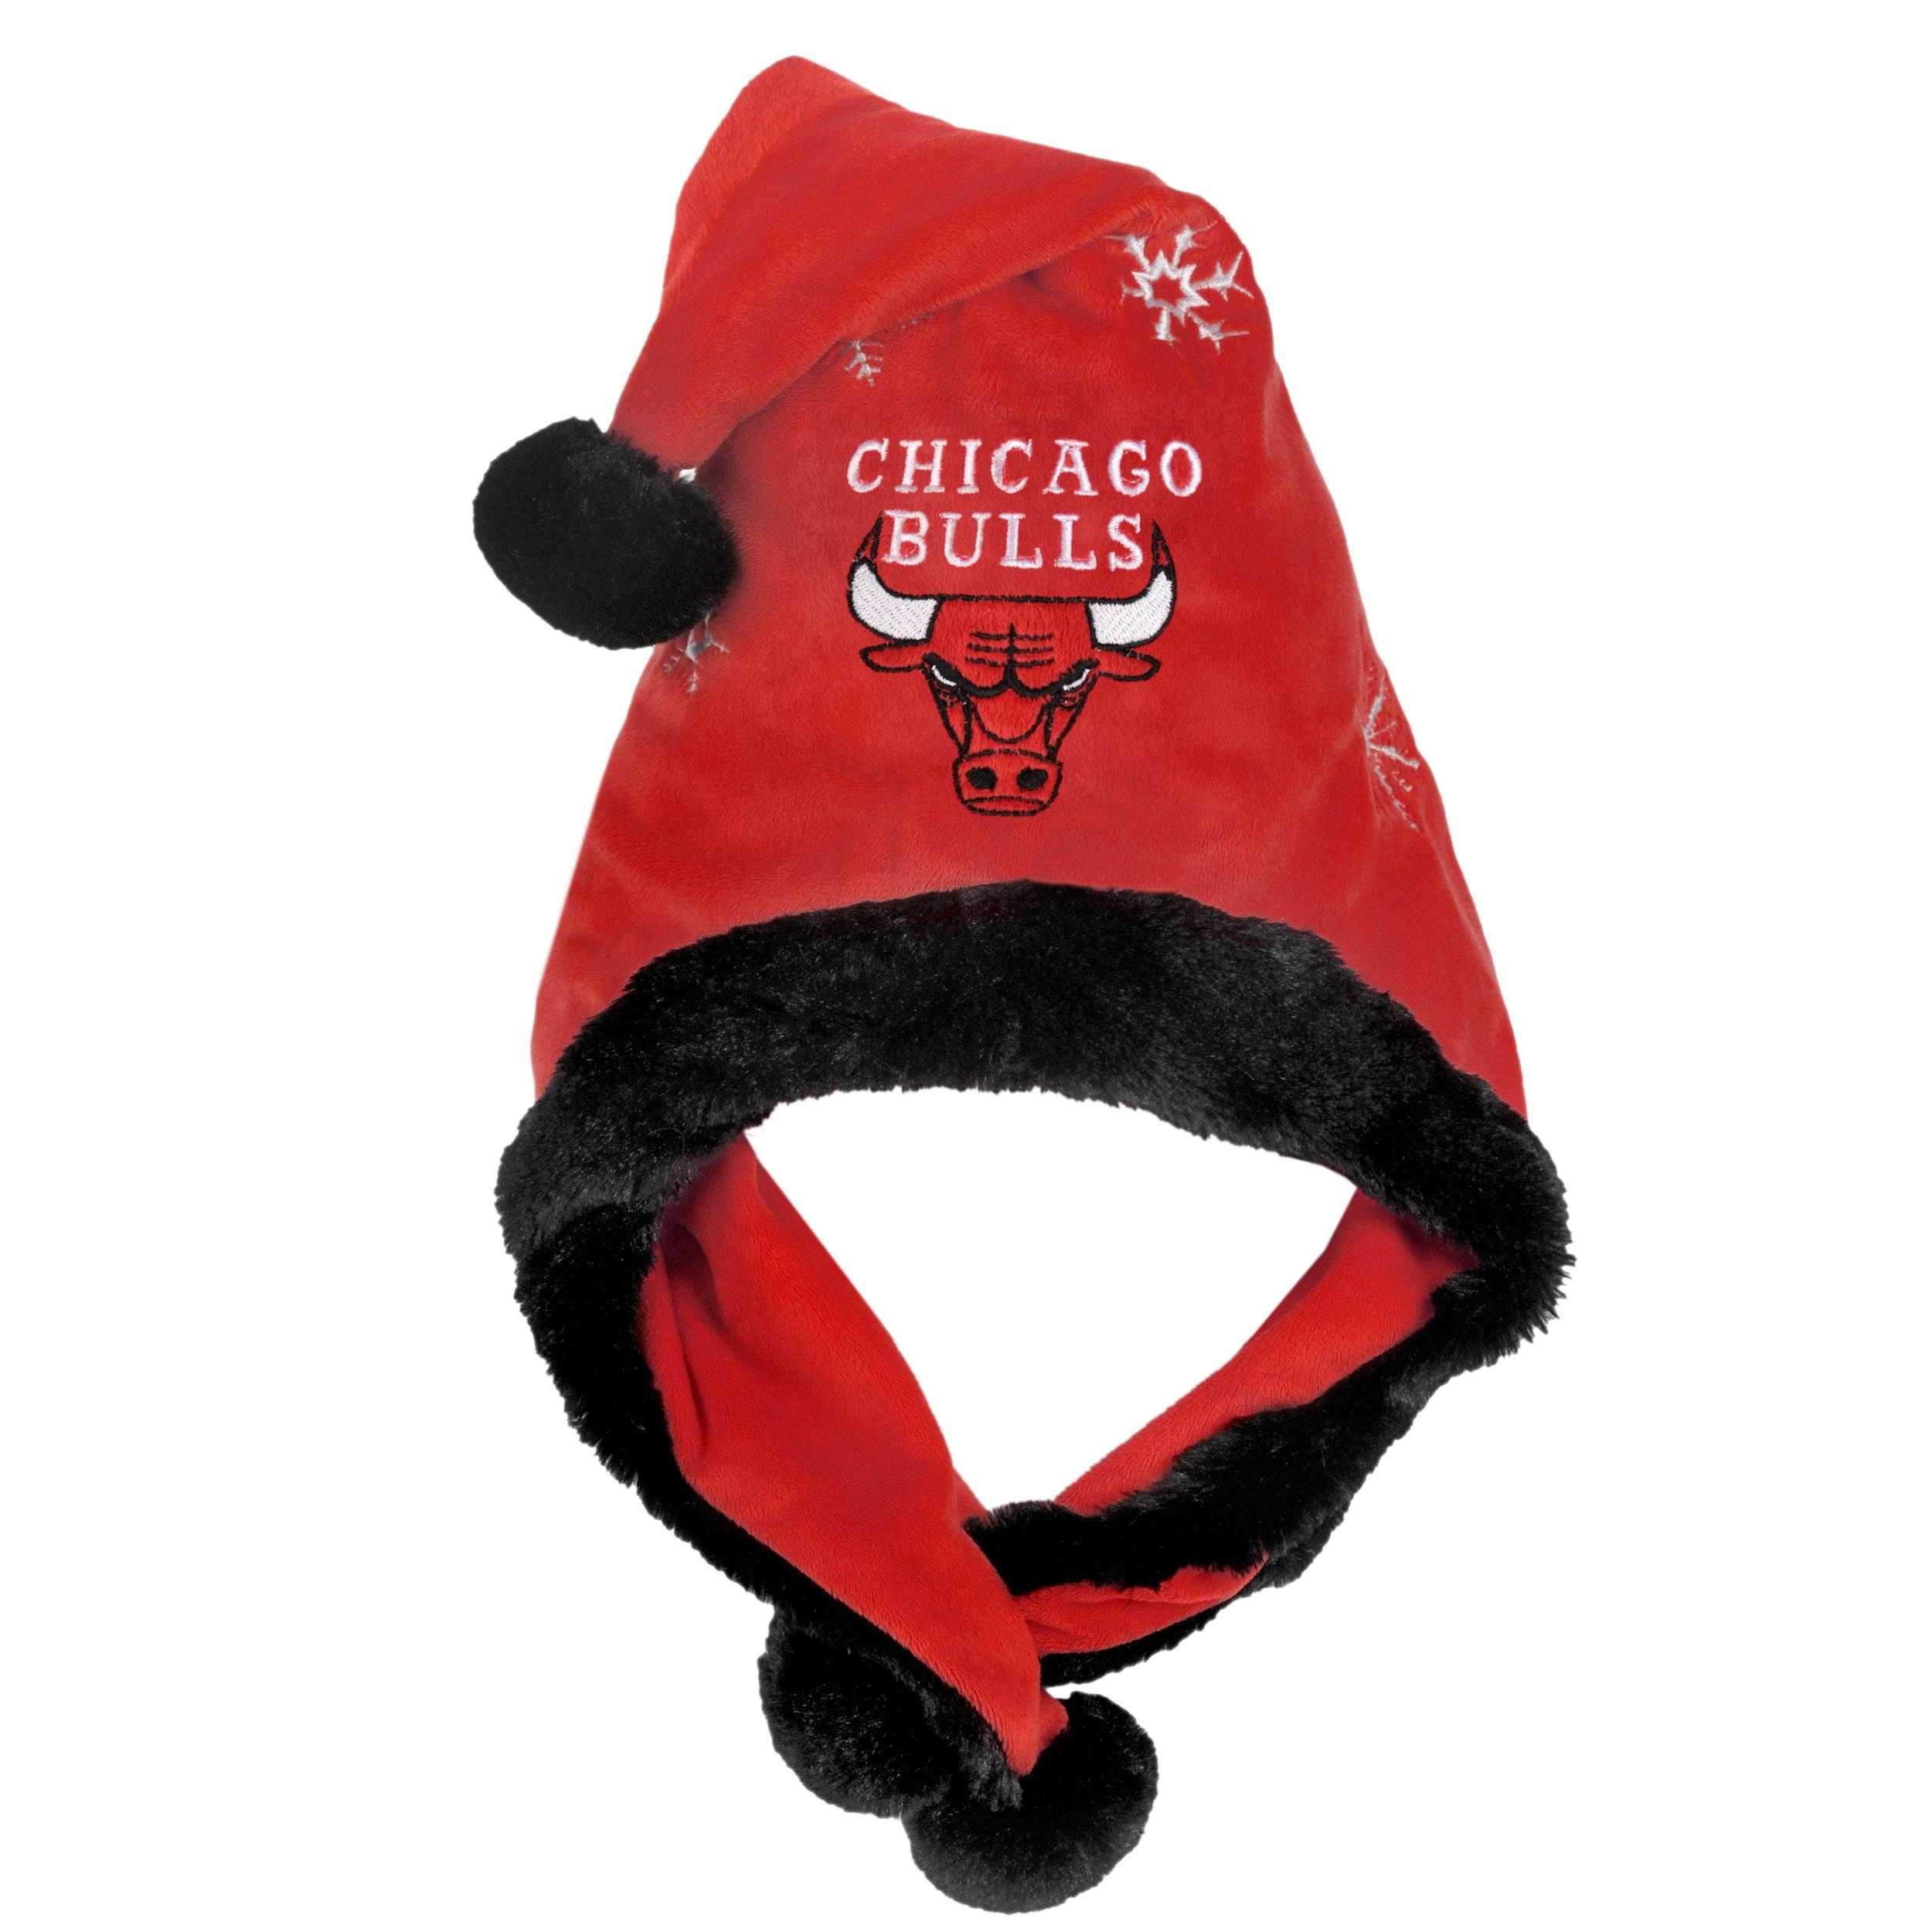 Chicago Bulls Thematic Santa Hat